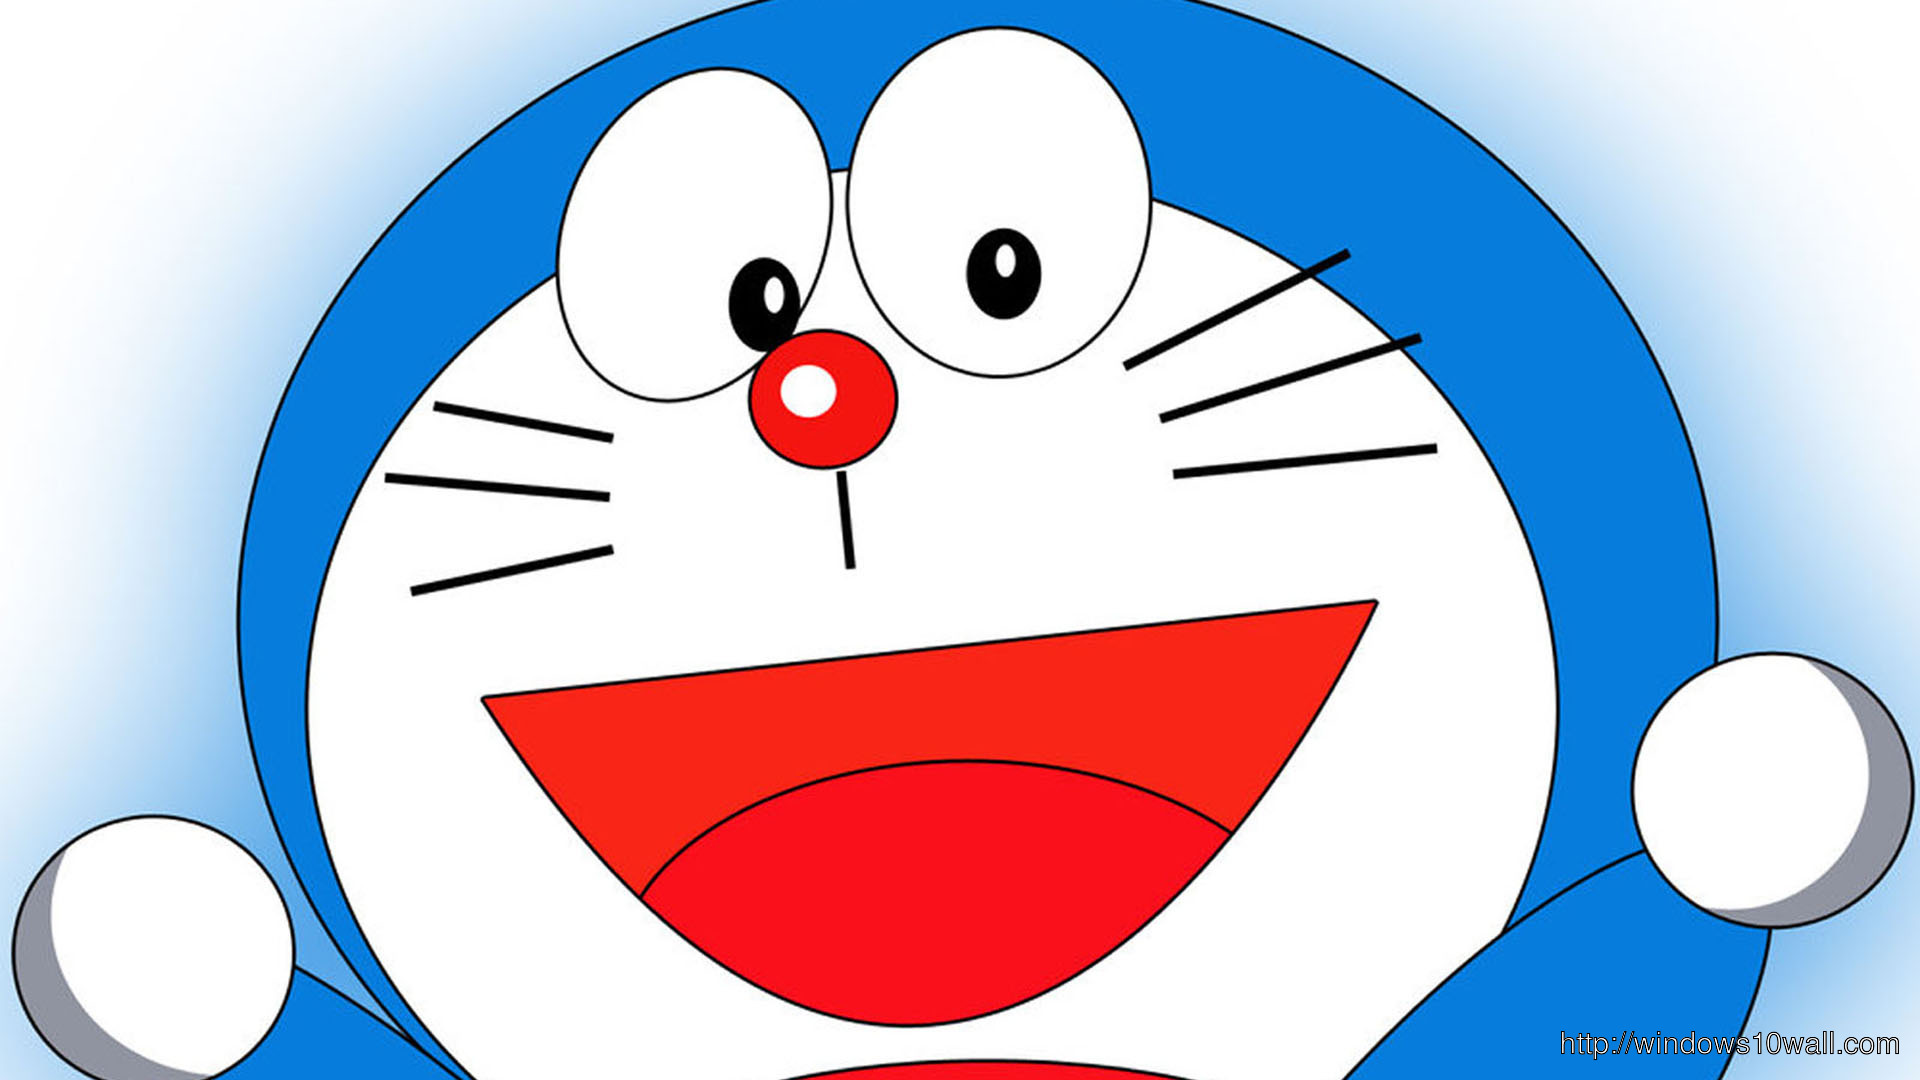 Alone Sad Quotes Wallpapers 1920x1080 Doraemon Hd Doraemon Windows 10 Wallpapers